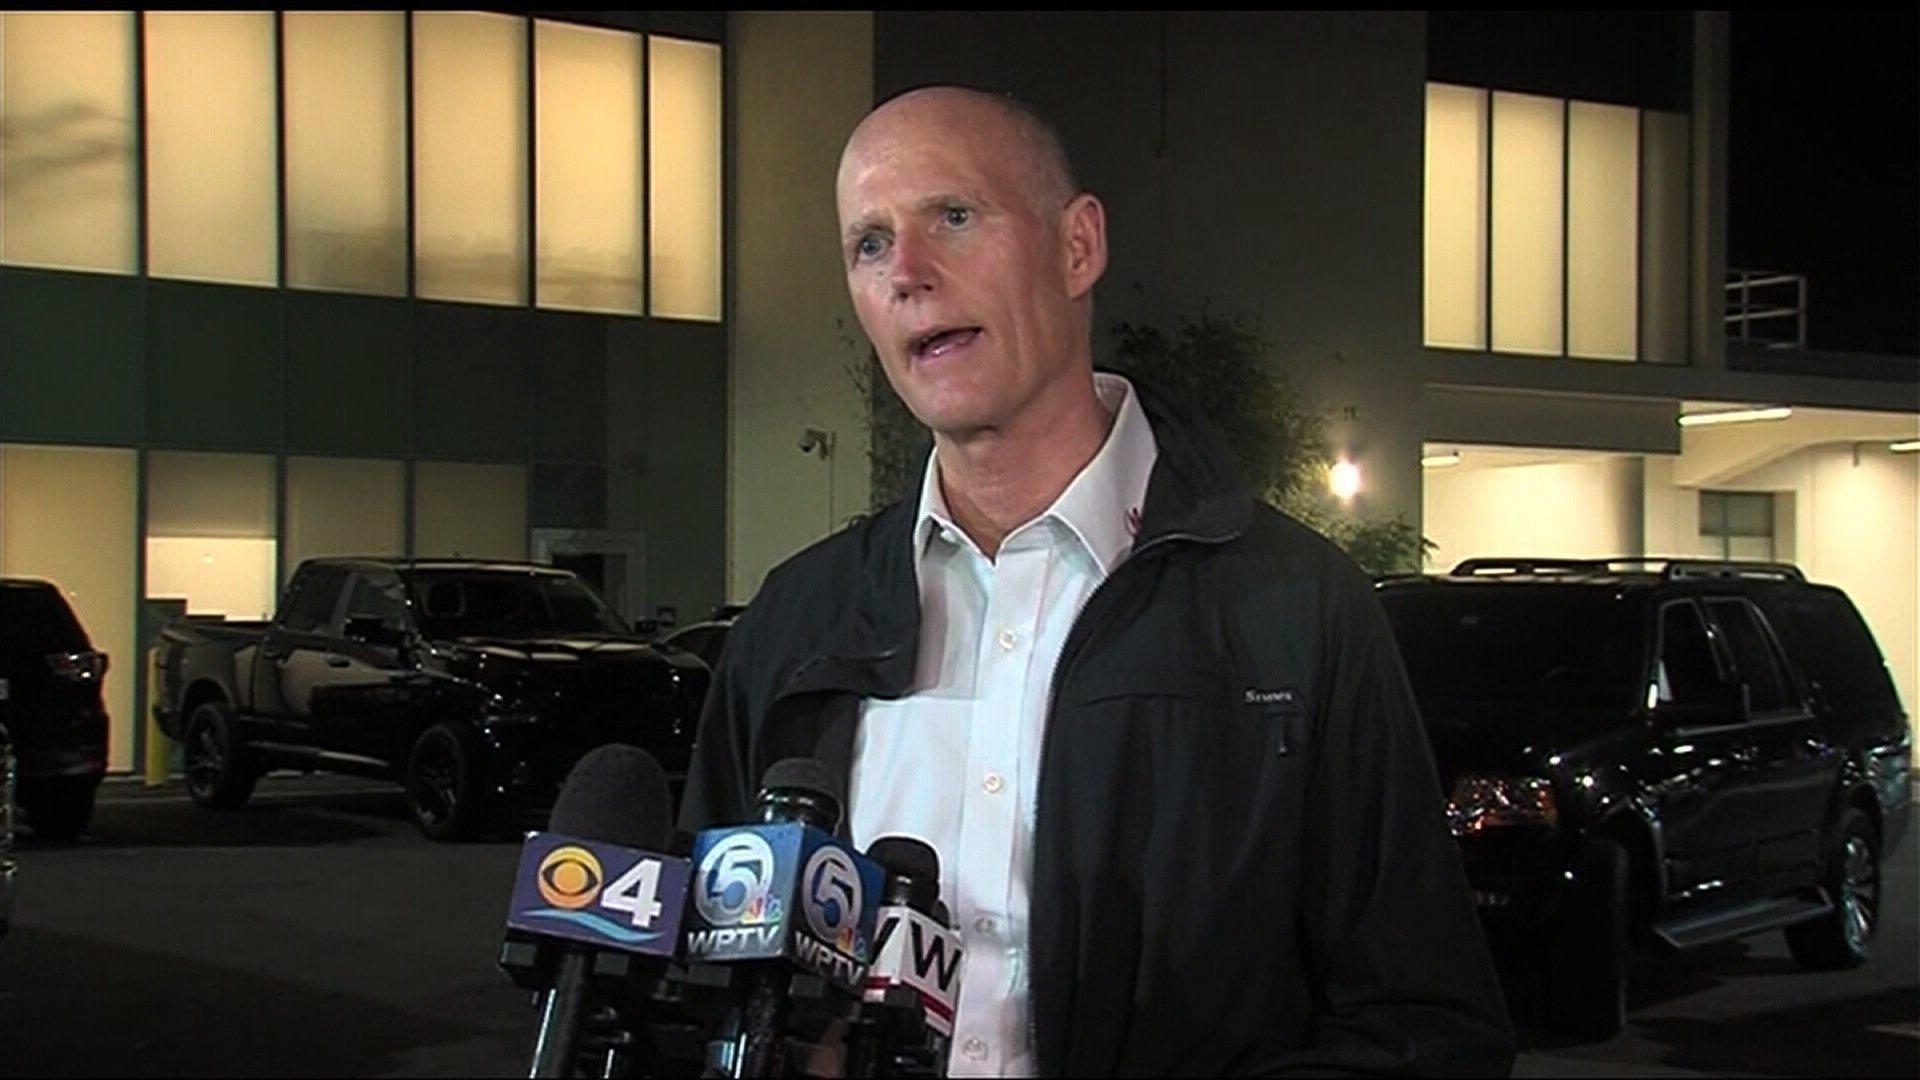 'The shots were close': 911 calls reveal moments of terror at Parkland